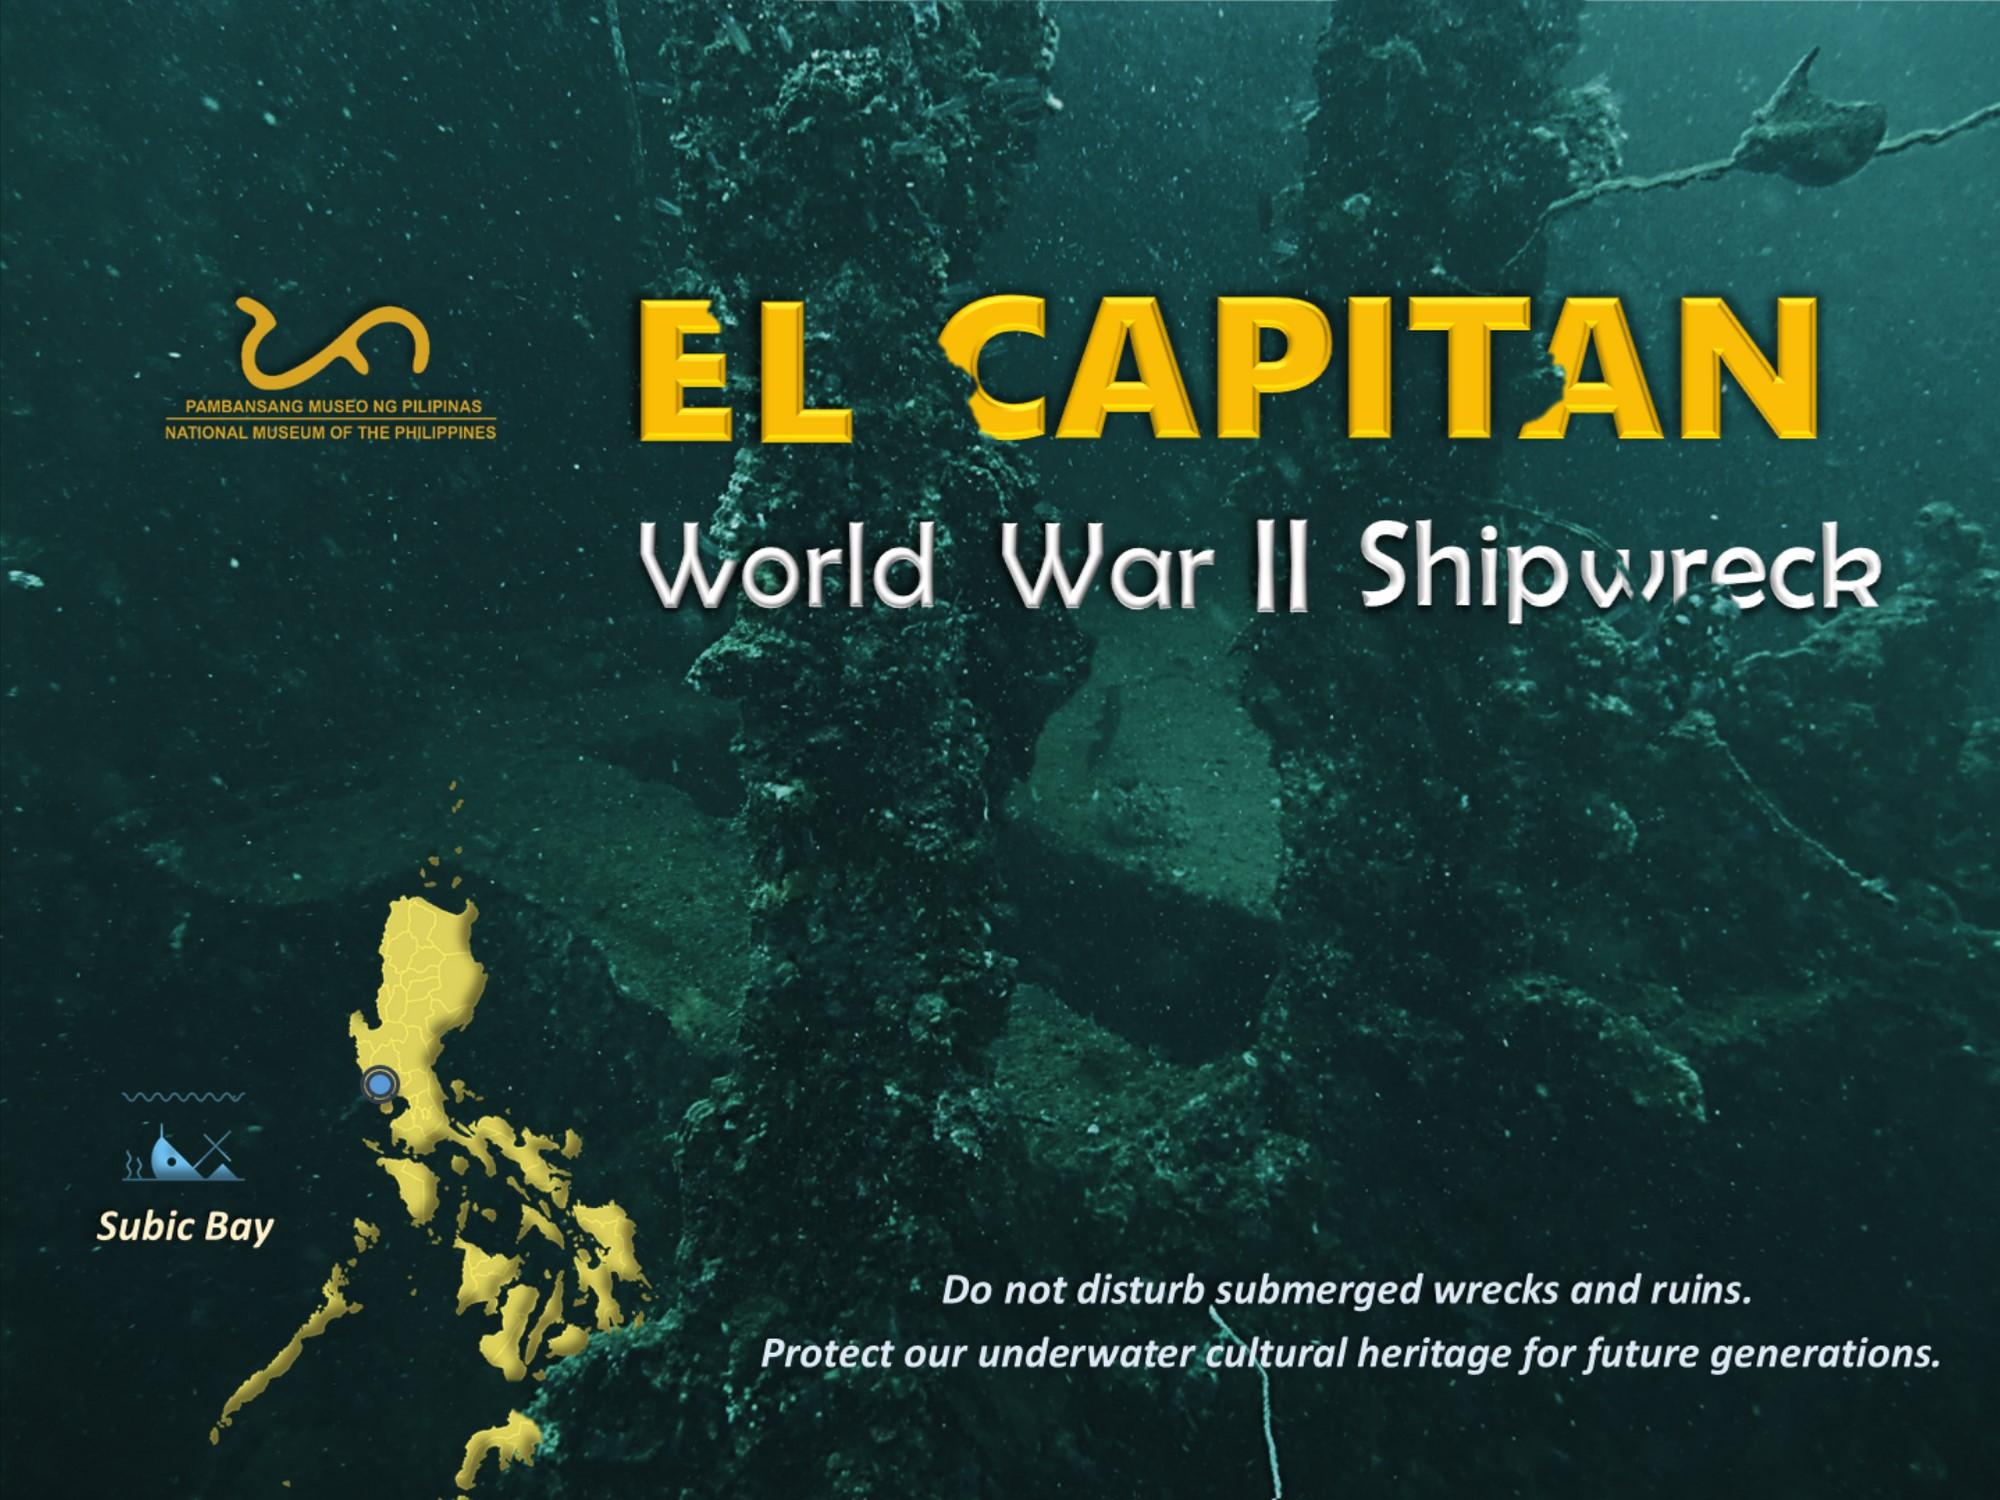 World Naval History - The most known World War II Shipwrecks - El Capitan, in Subic Bay, Zambales